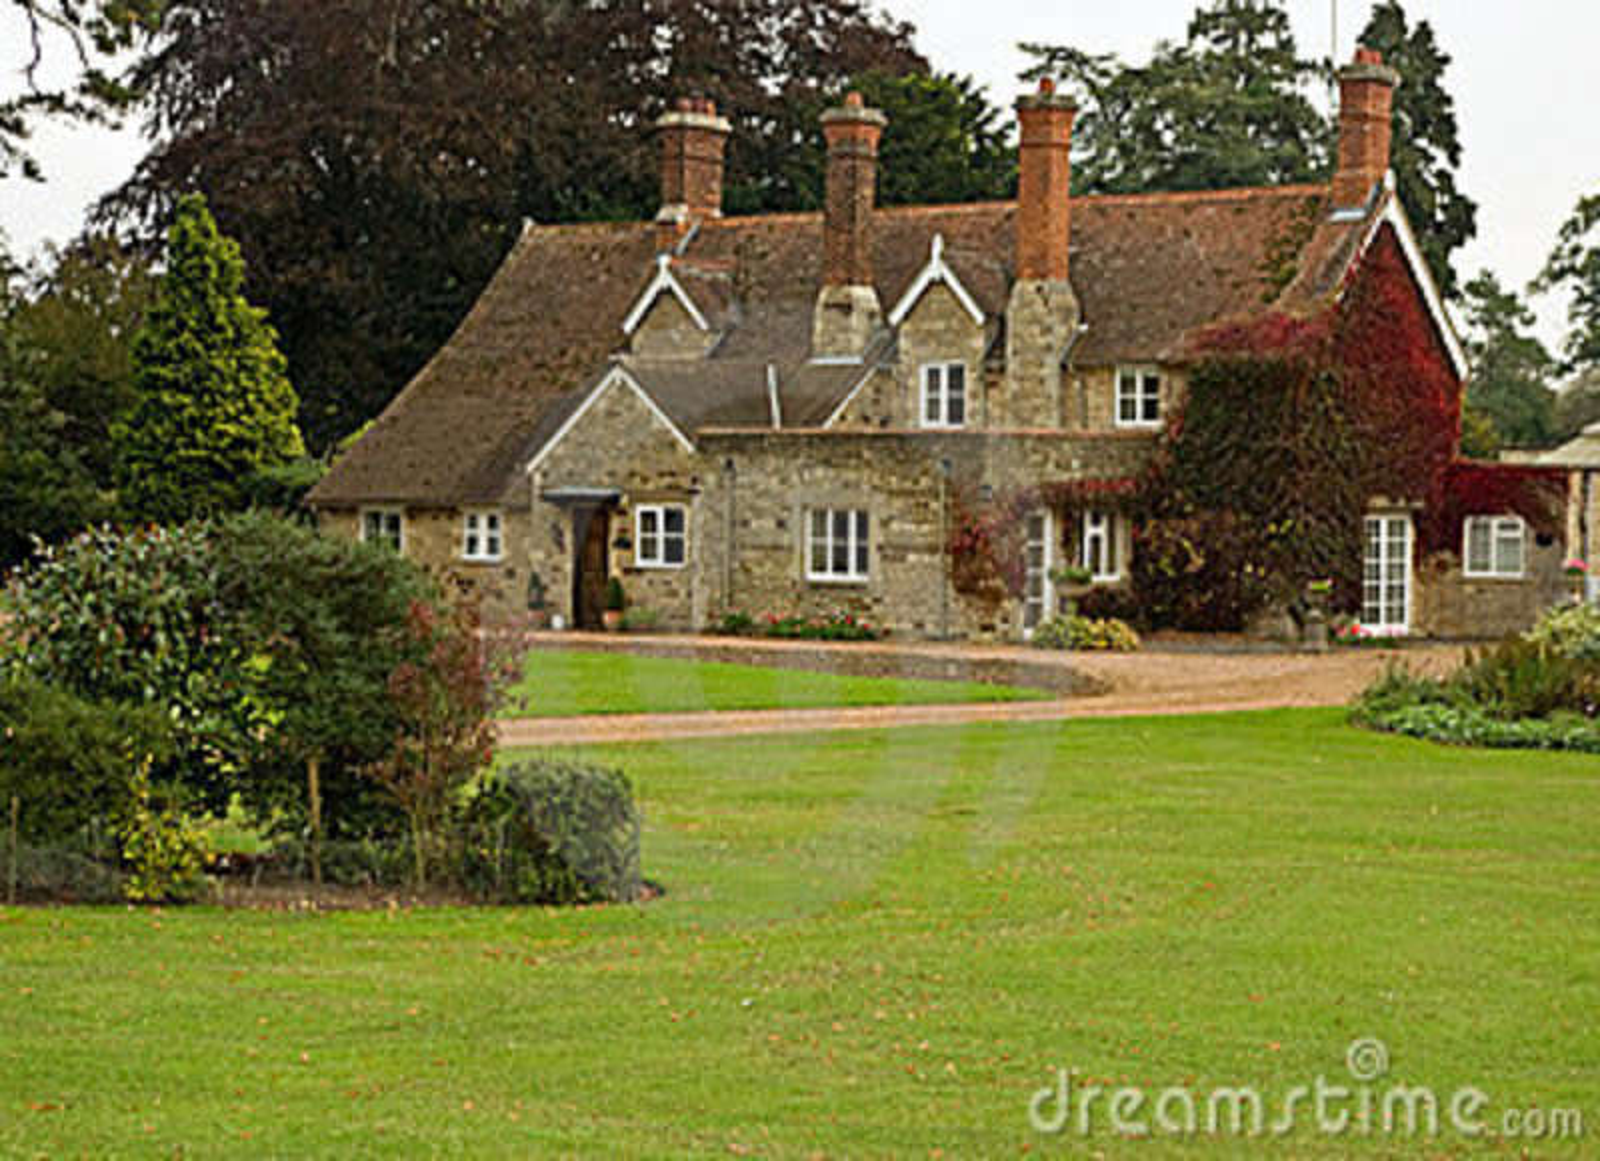 casa di campagna inglese immagine stock immagine 6599771